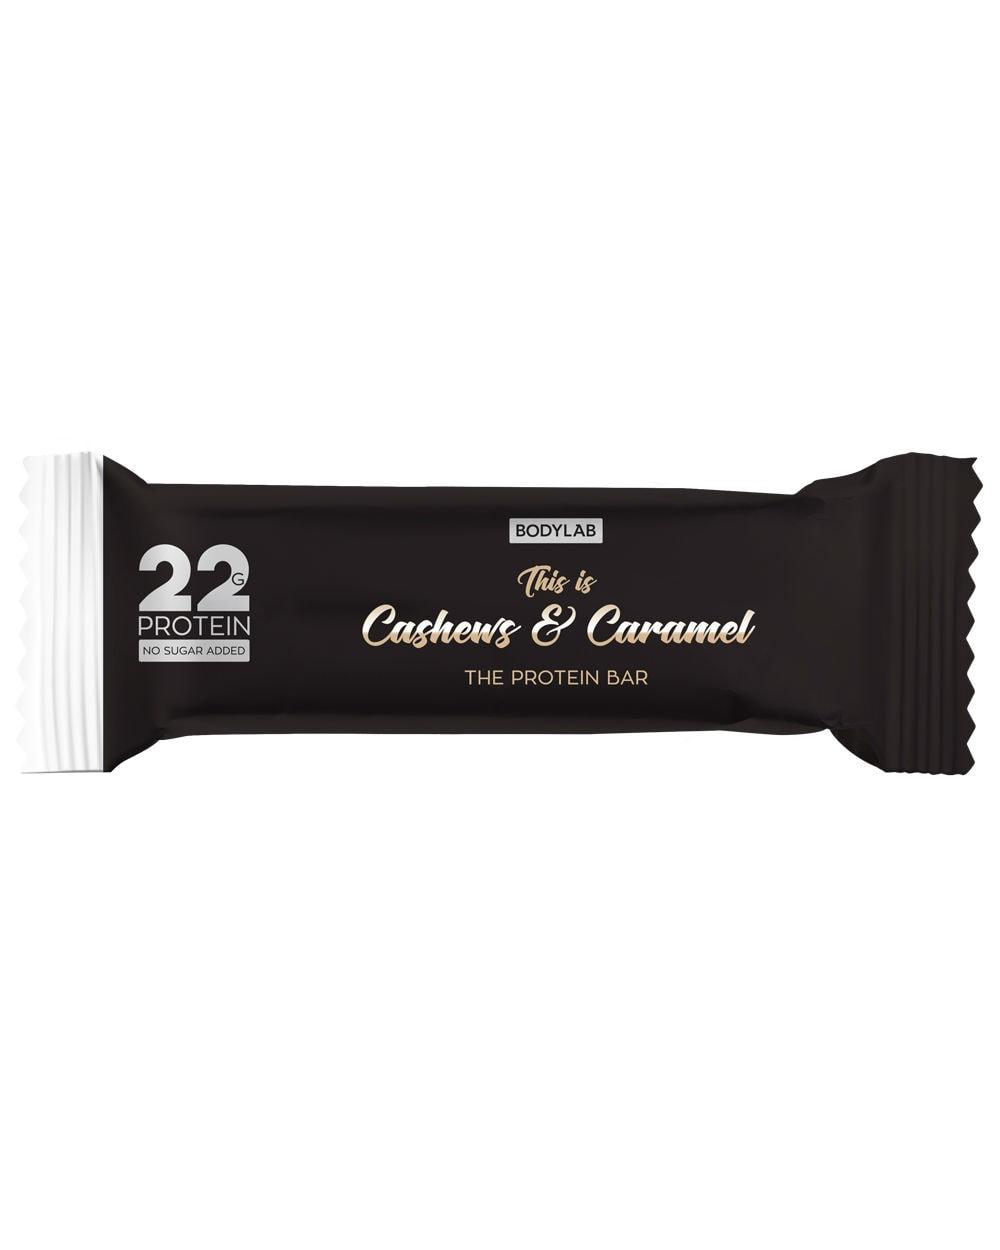 bodylab_theproteinbar_cashews_and_caramel_bar